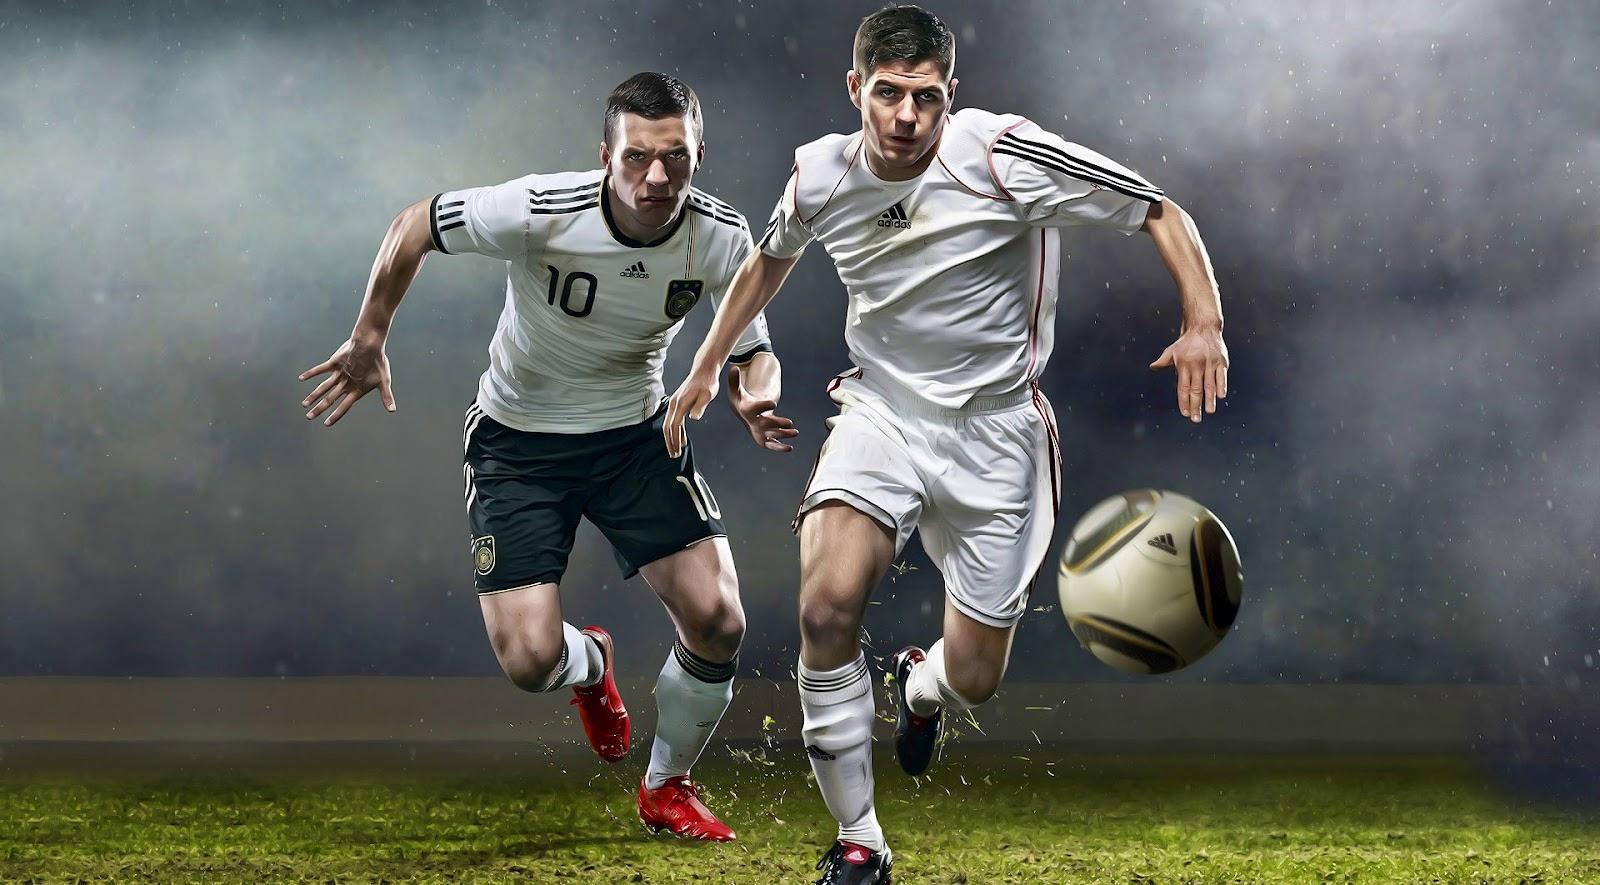 cn sport fotbal www.cnsport.ro